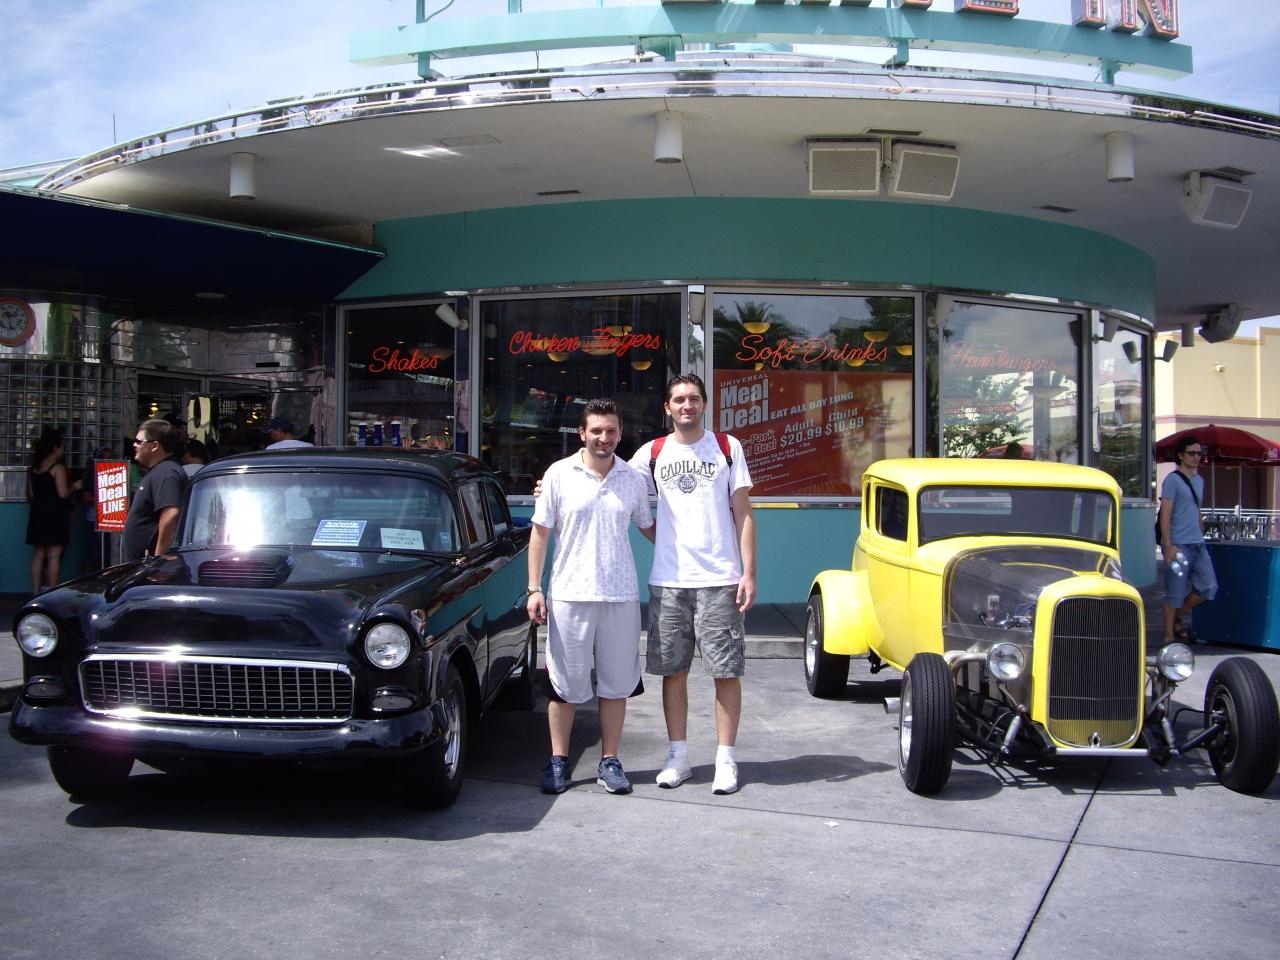 Universal Studio Orlando Brunoricaine